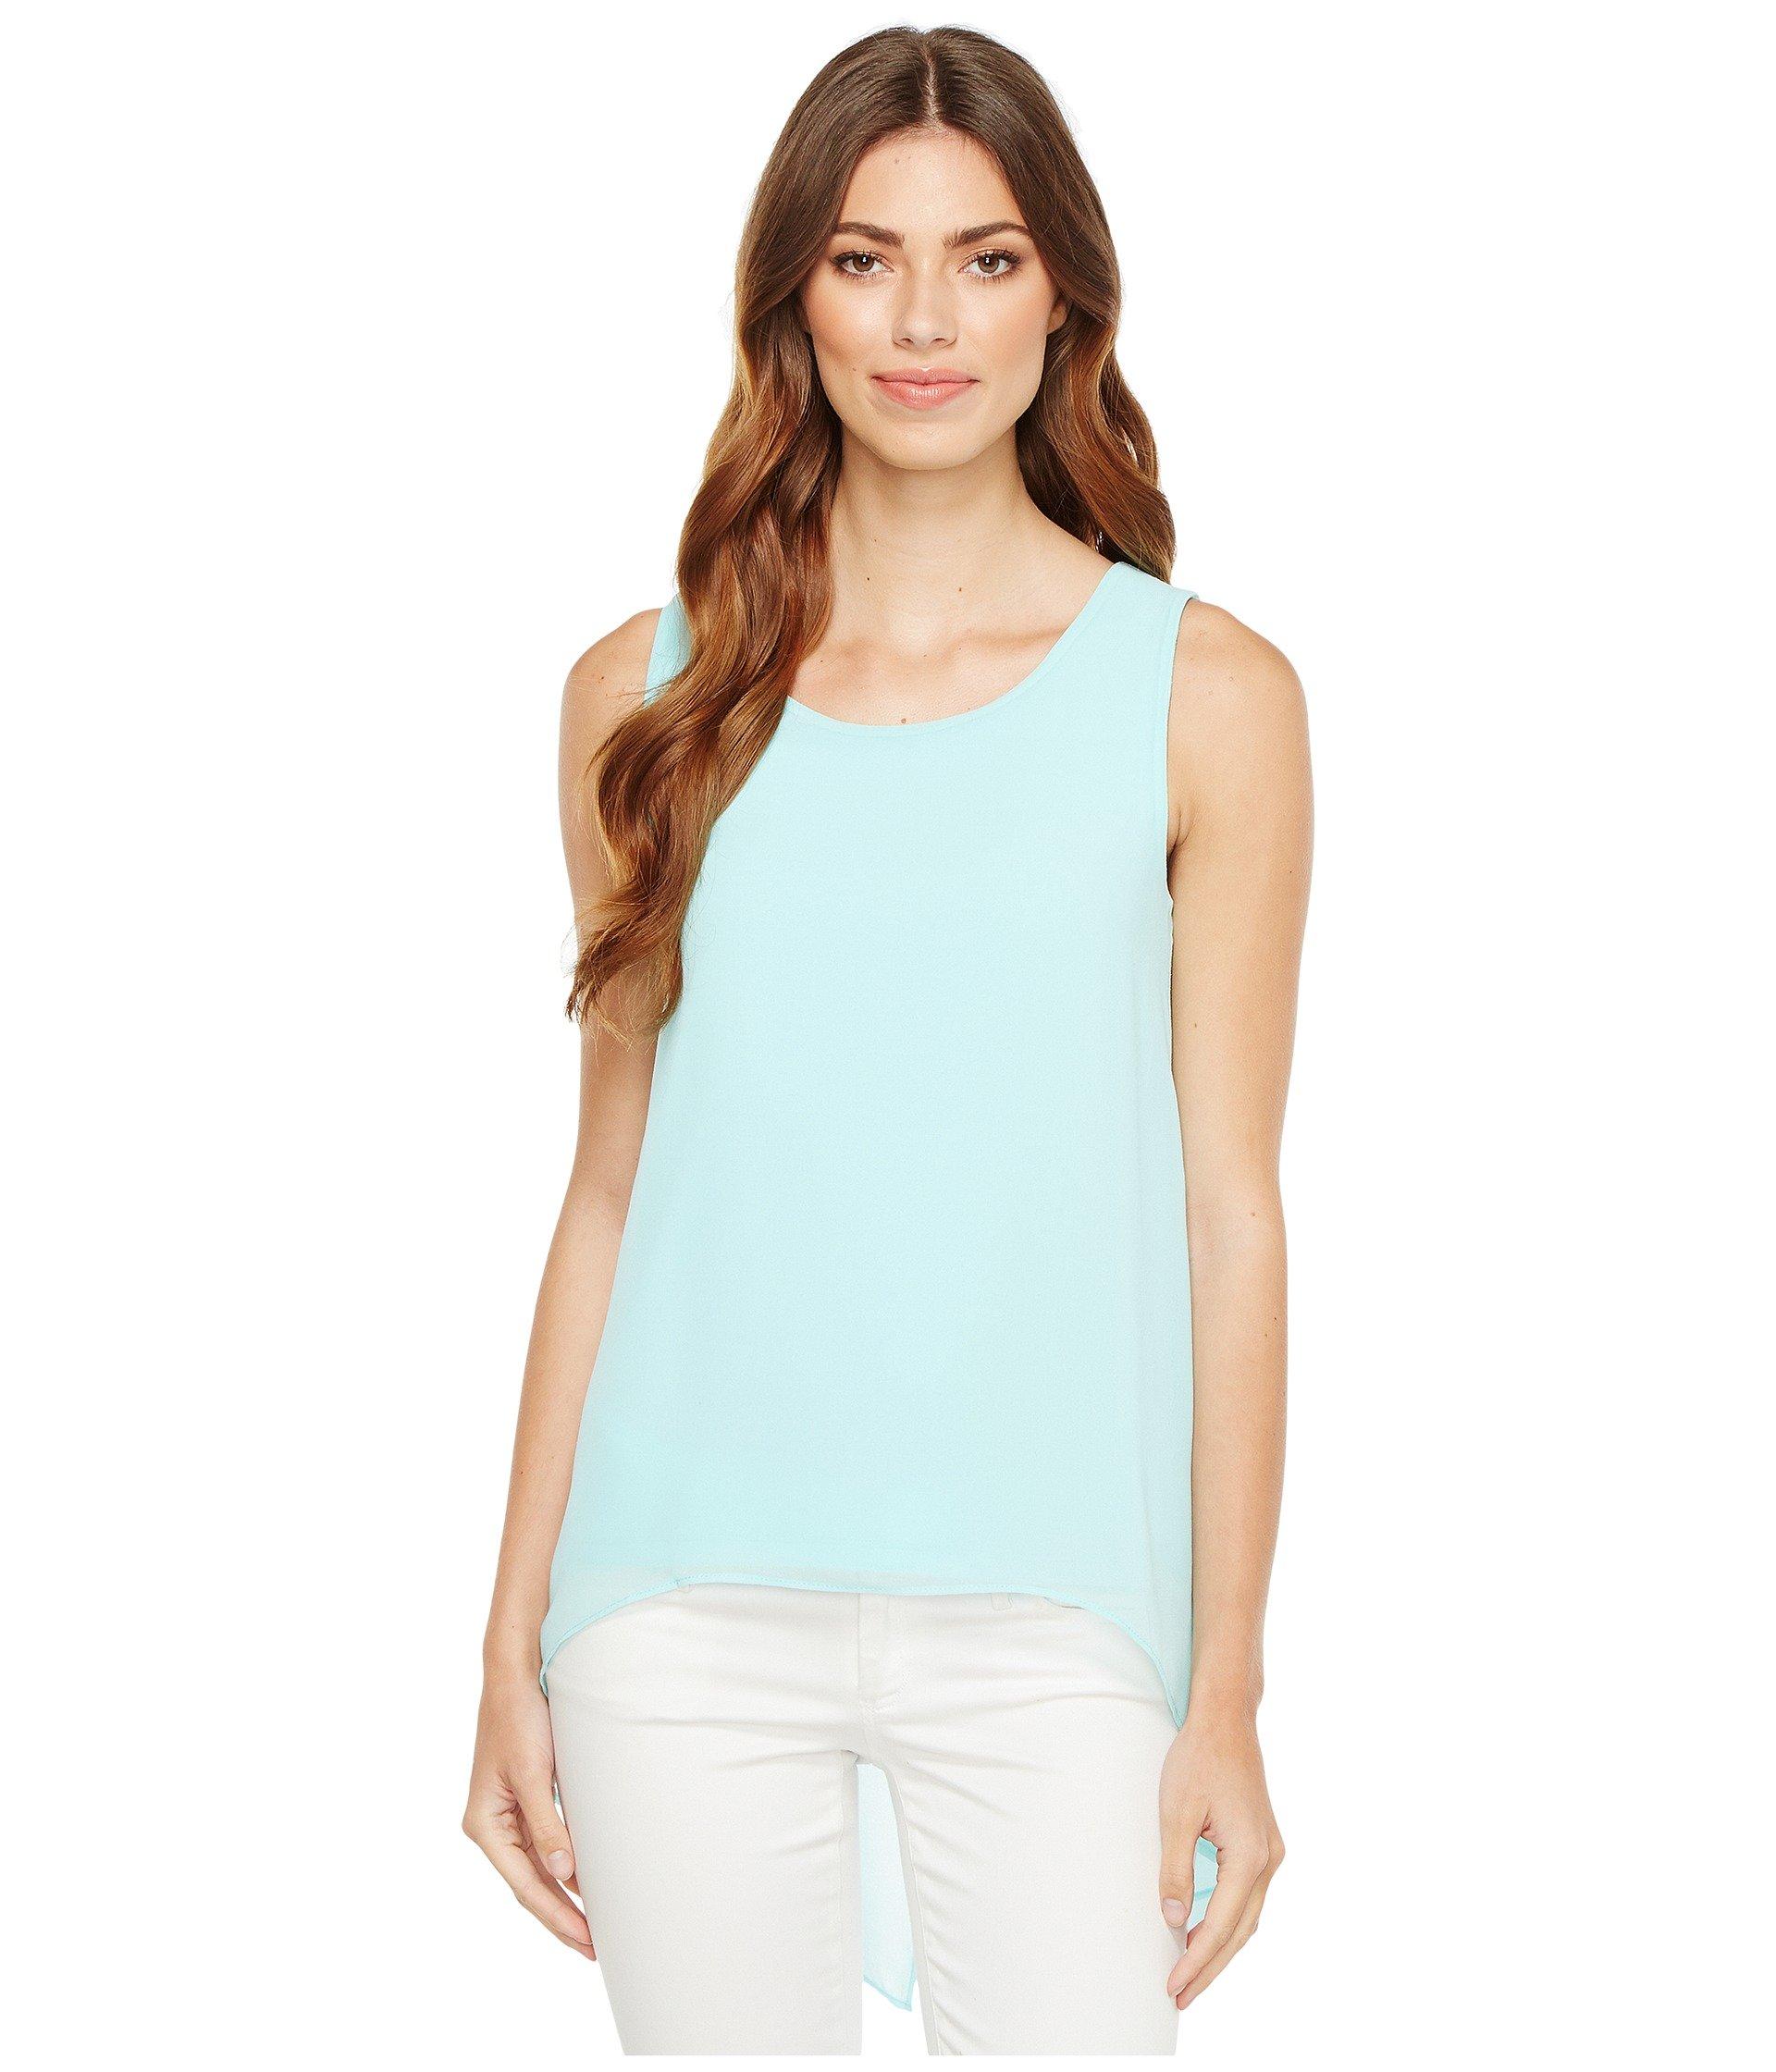 Calvin Klein Women's Slit Back Top with Chiffon Overlay Seaglass Shirt